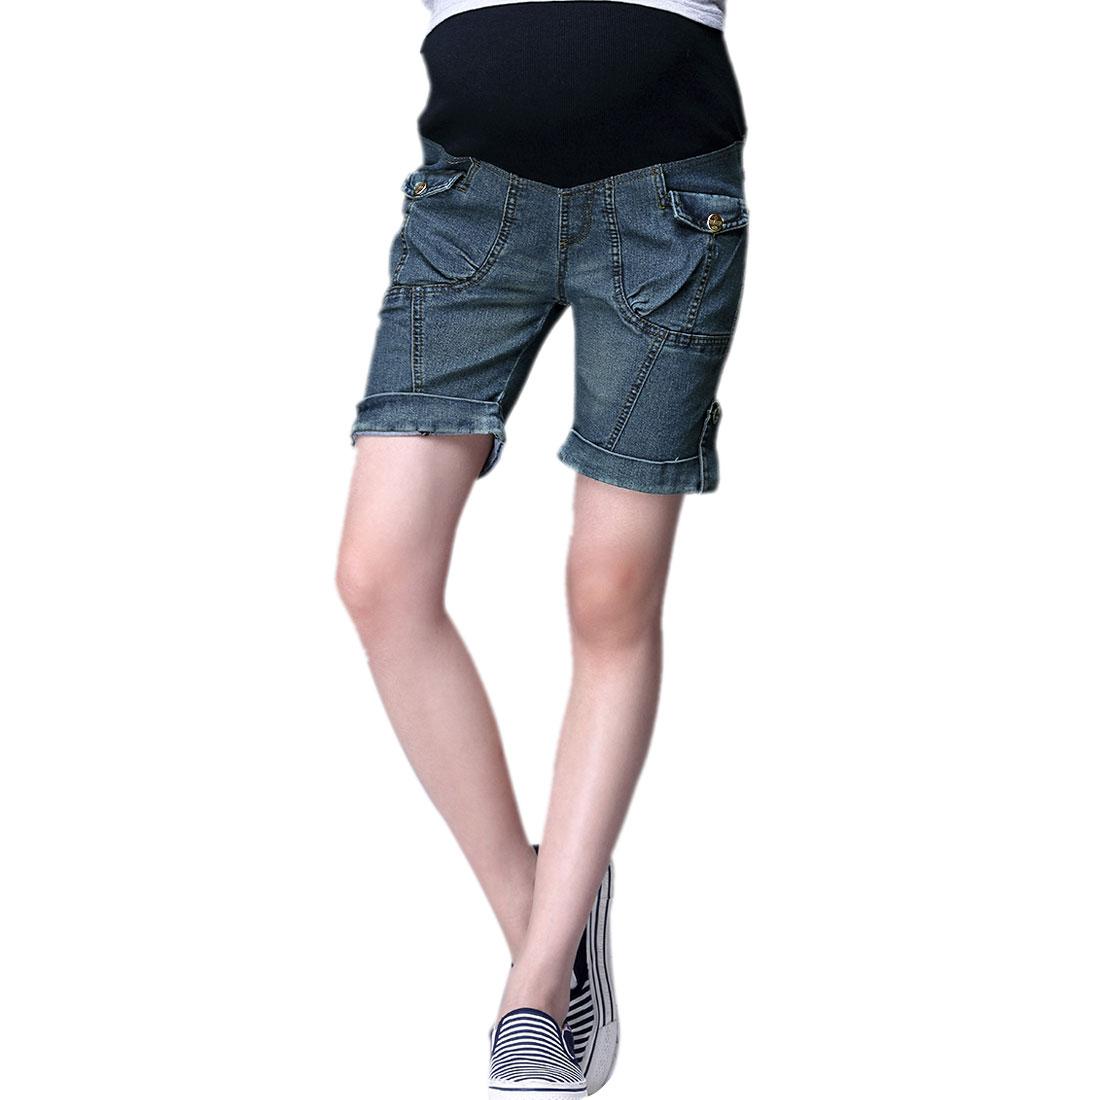 Pregnant Women Elastic Waist Big Pockets Panel Shorts Blue XS